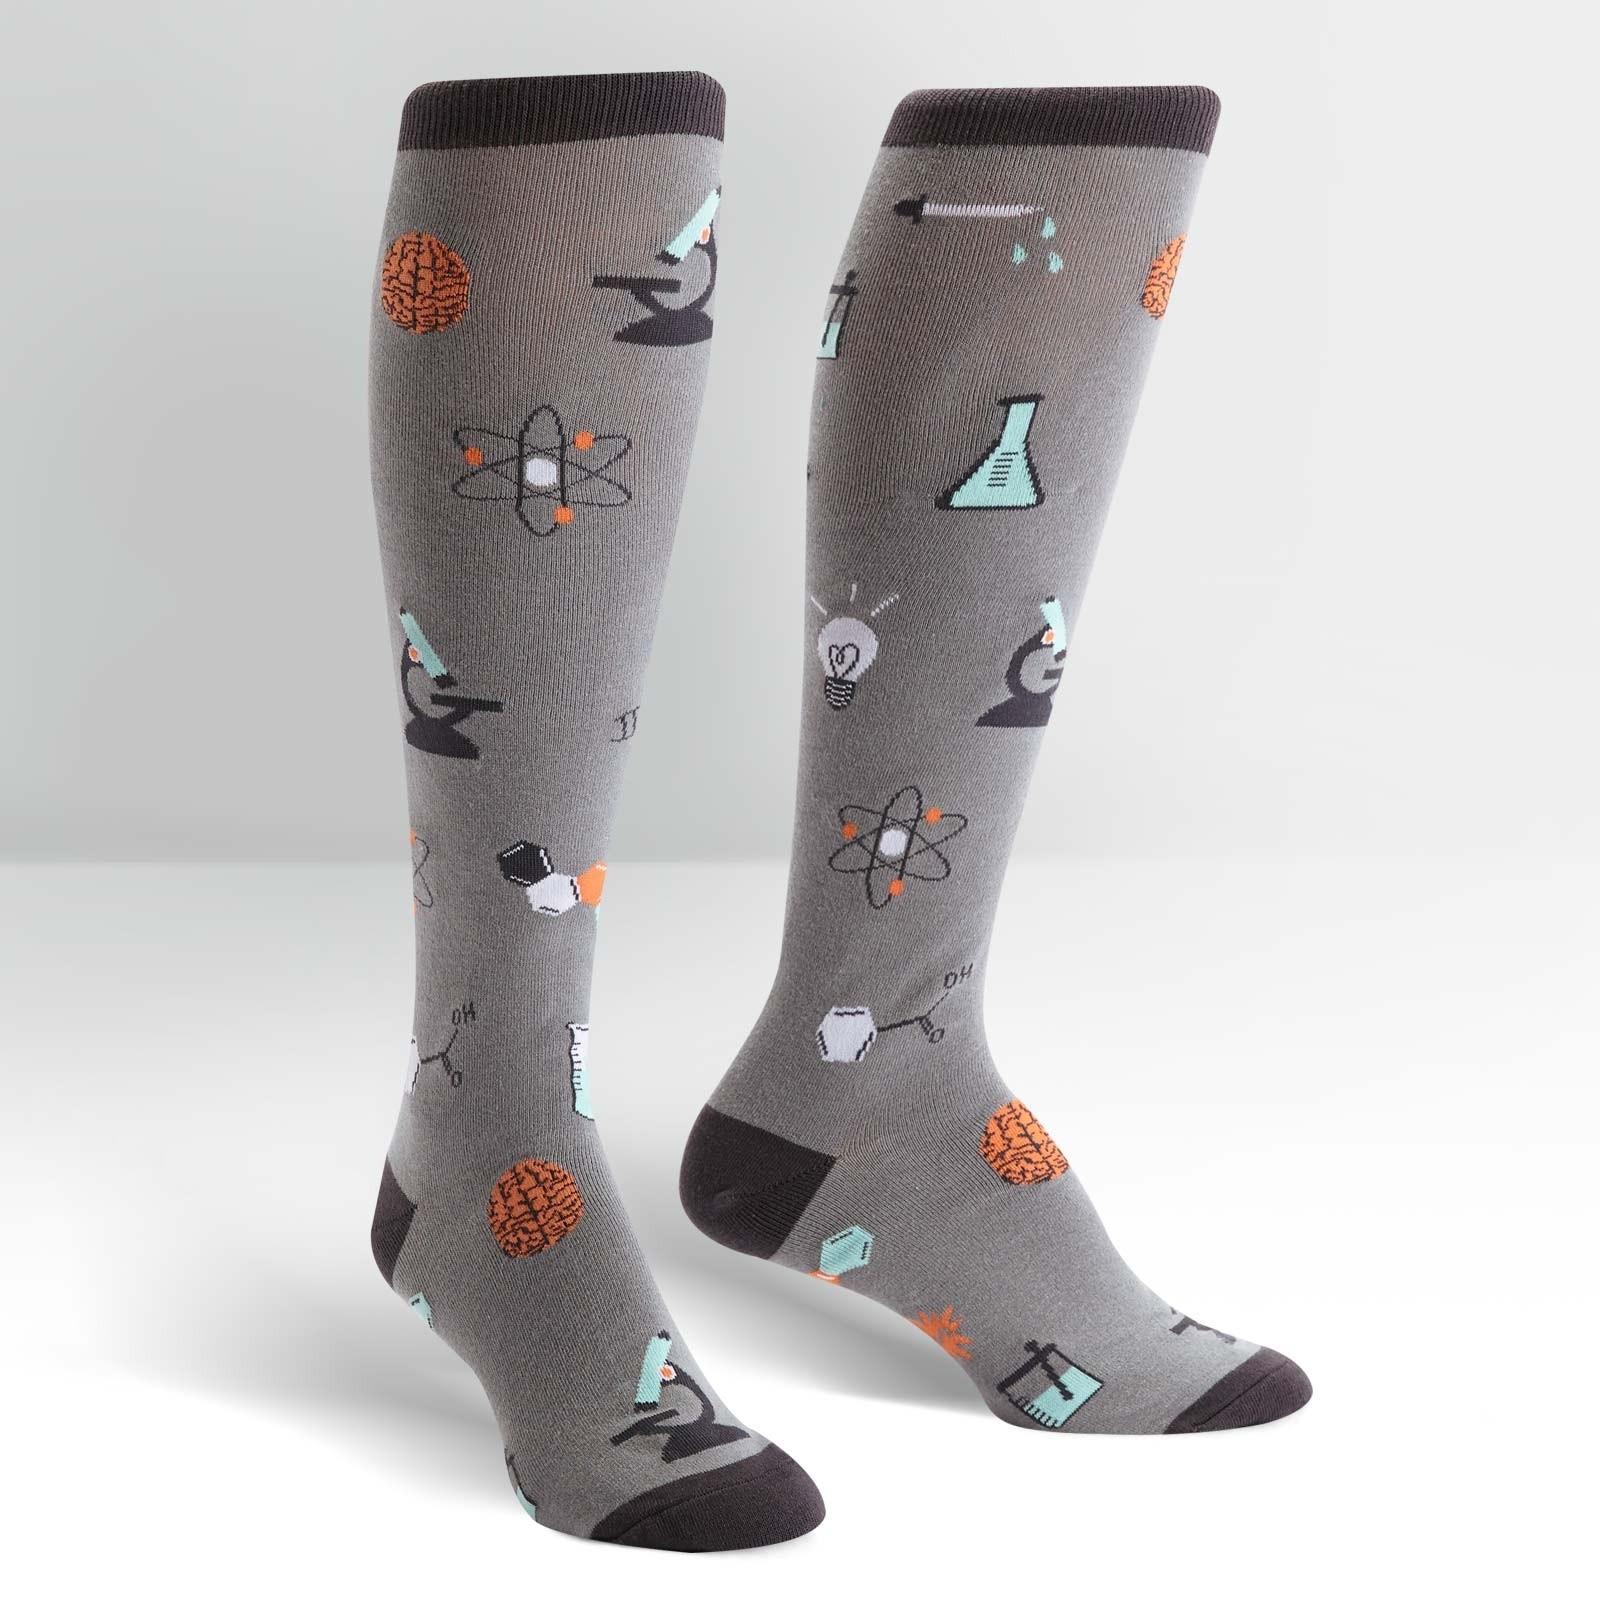 Science socks knee high